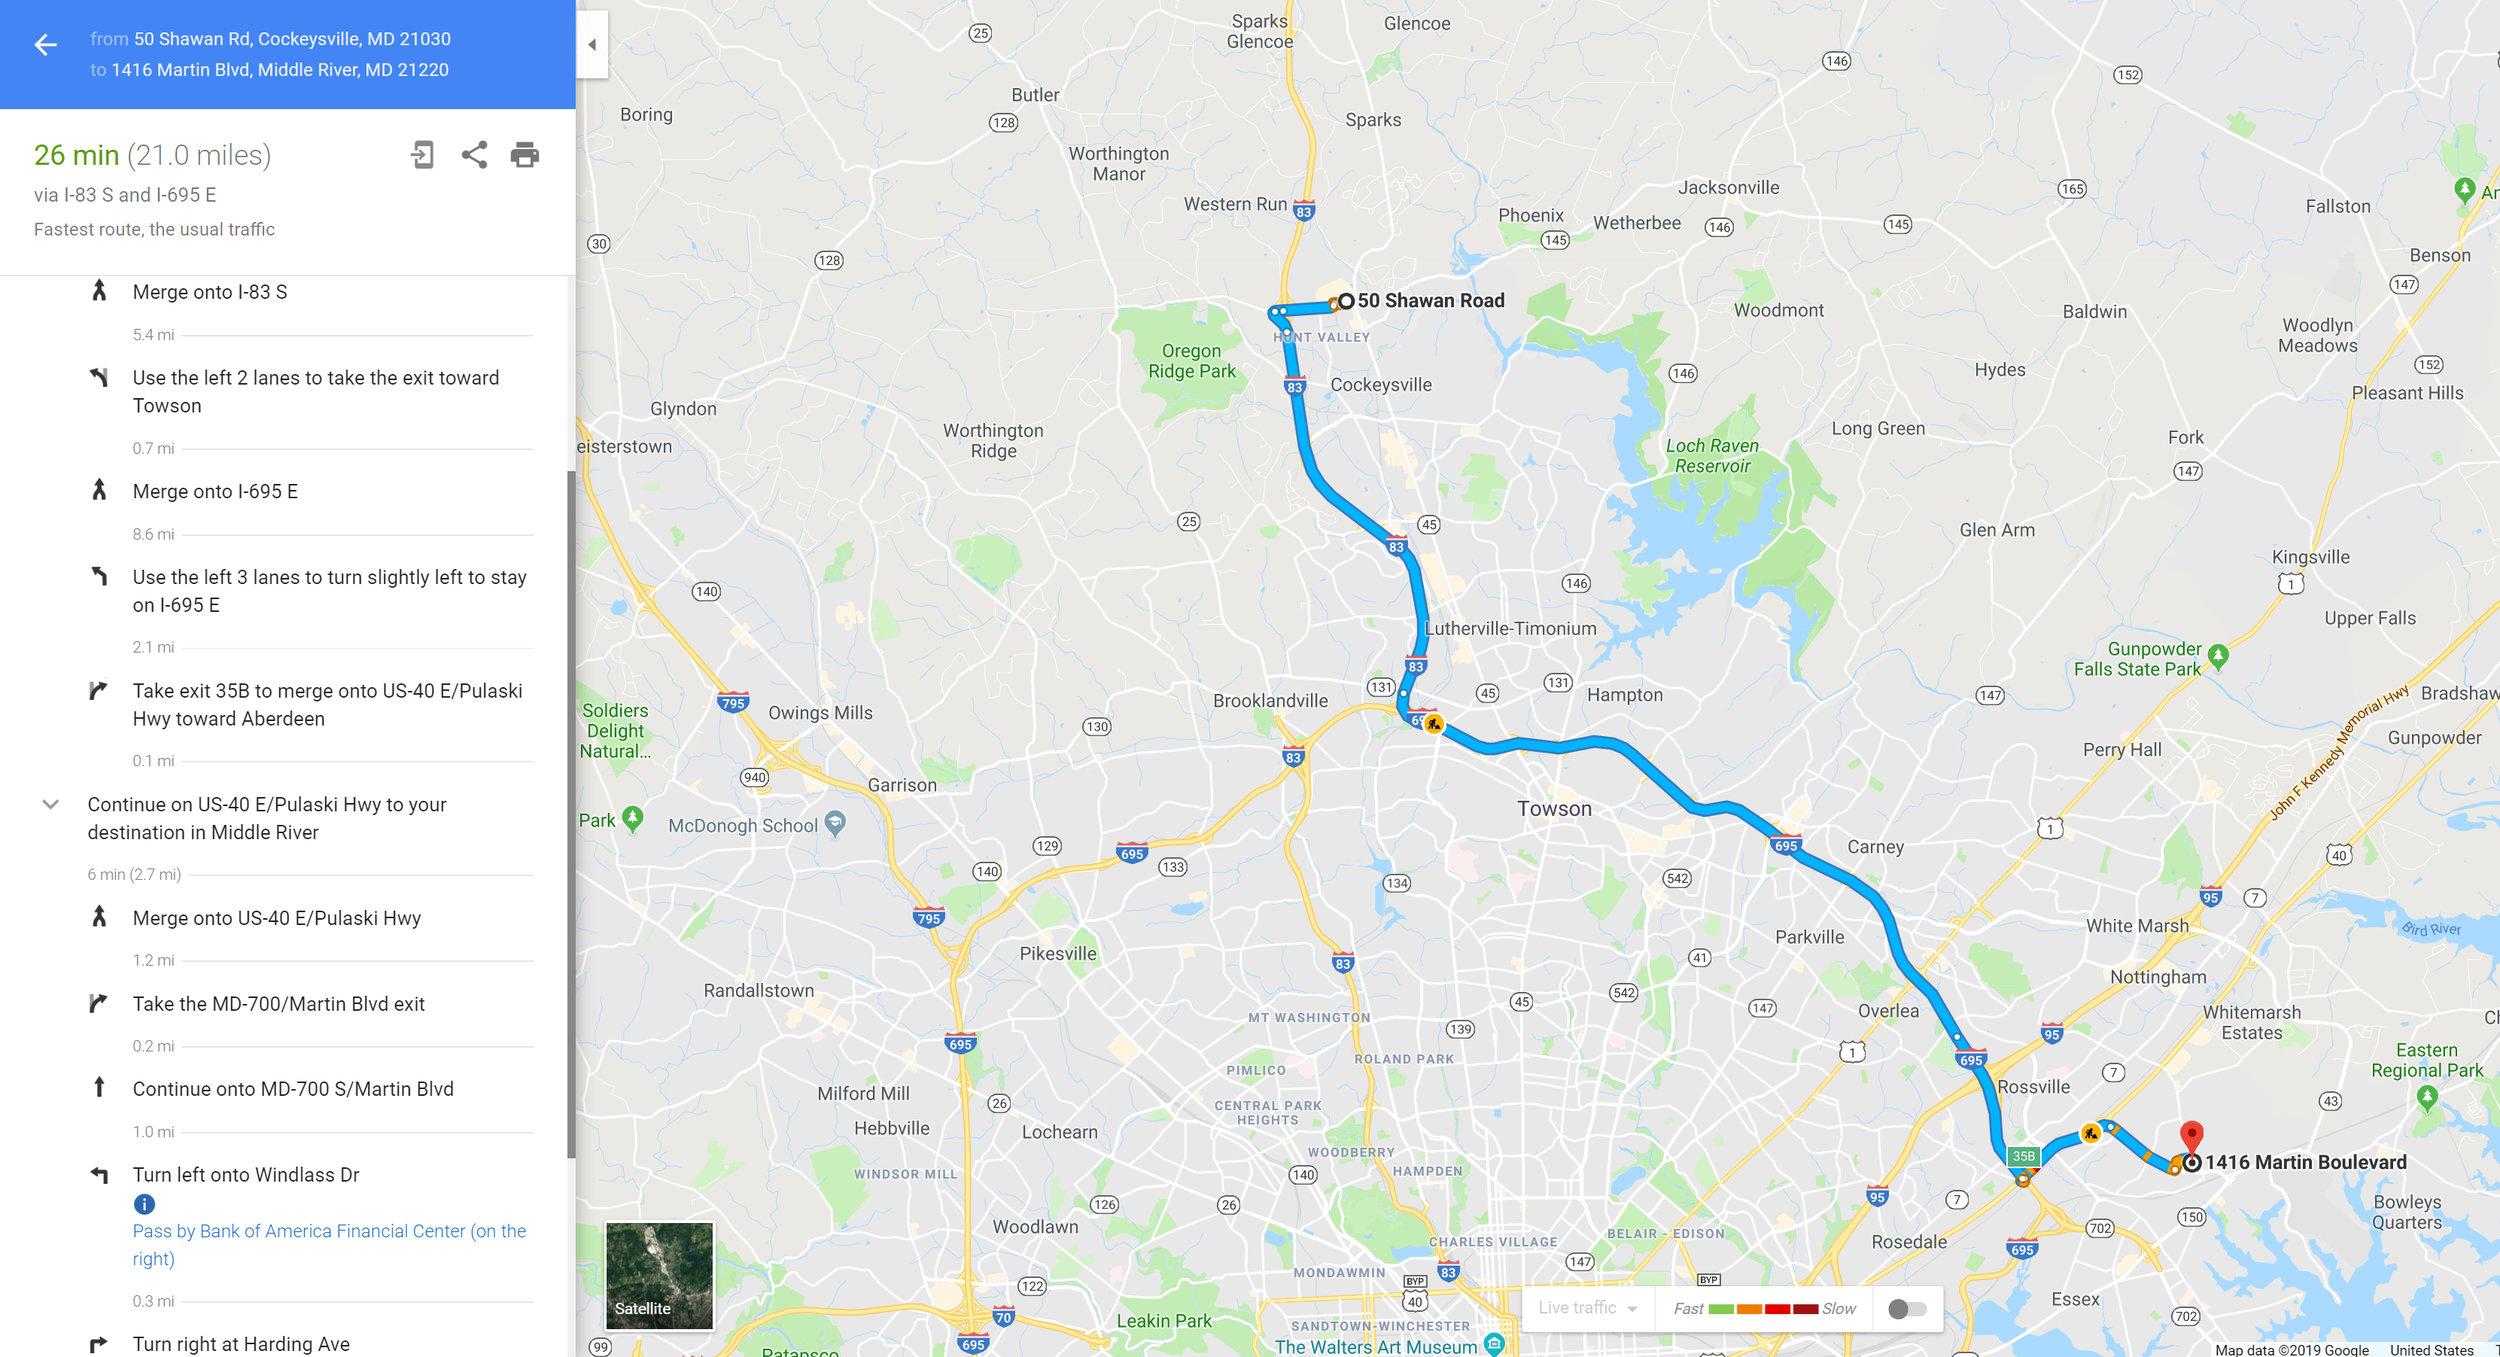 Directions from HVH to DG Balt East 2-14-19.jpg